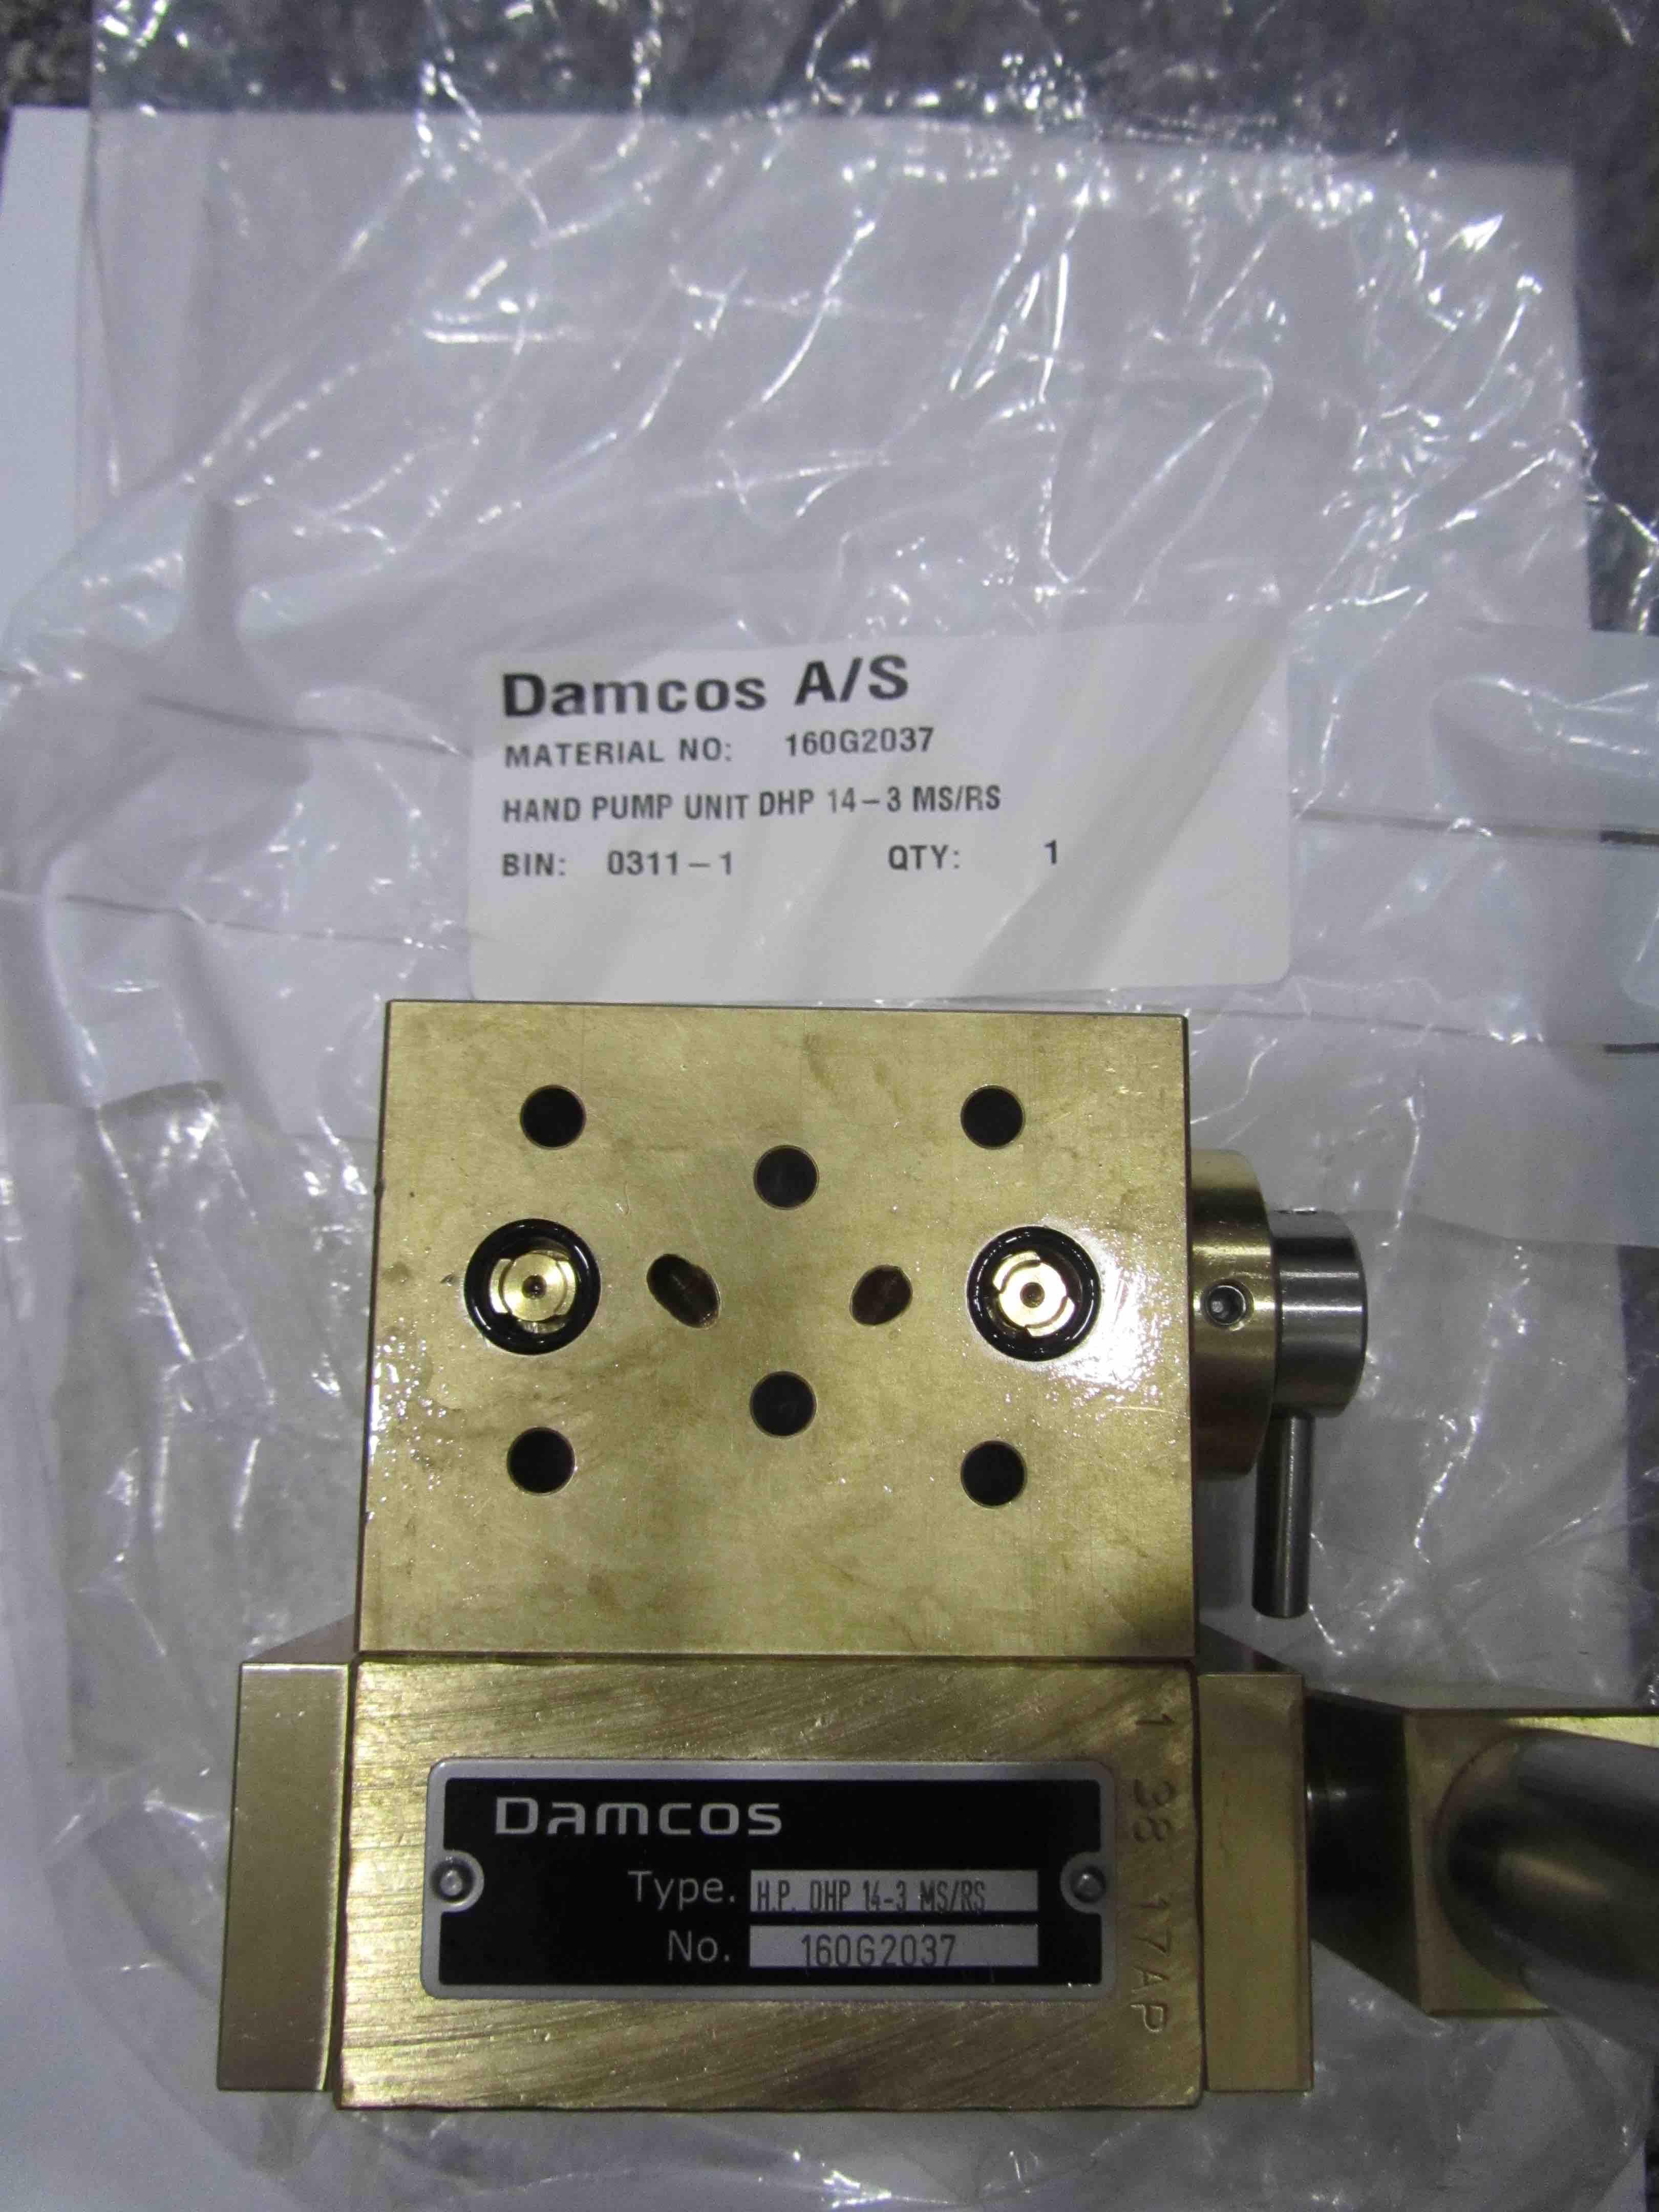 DHP 14-3 MS:RS